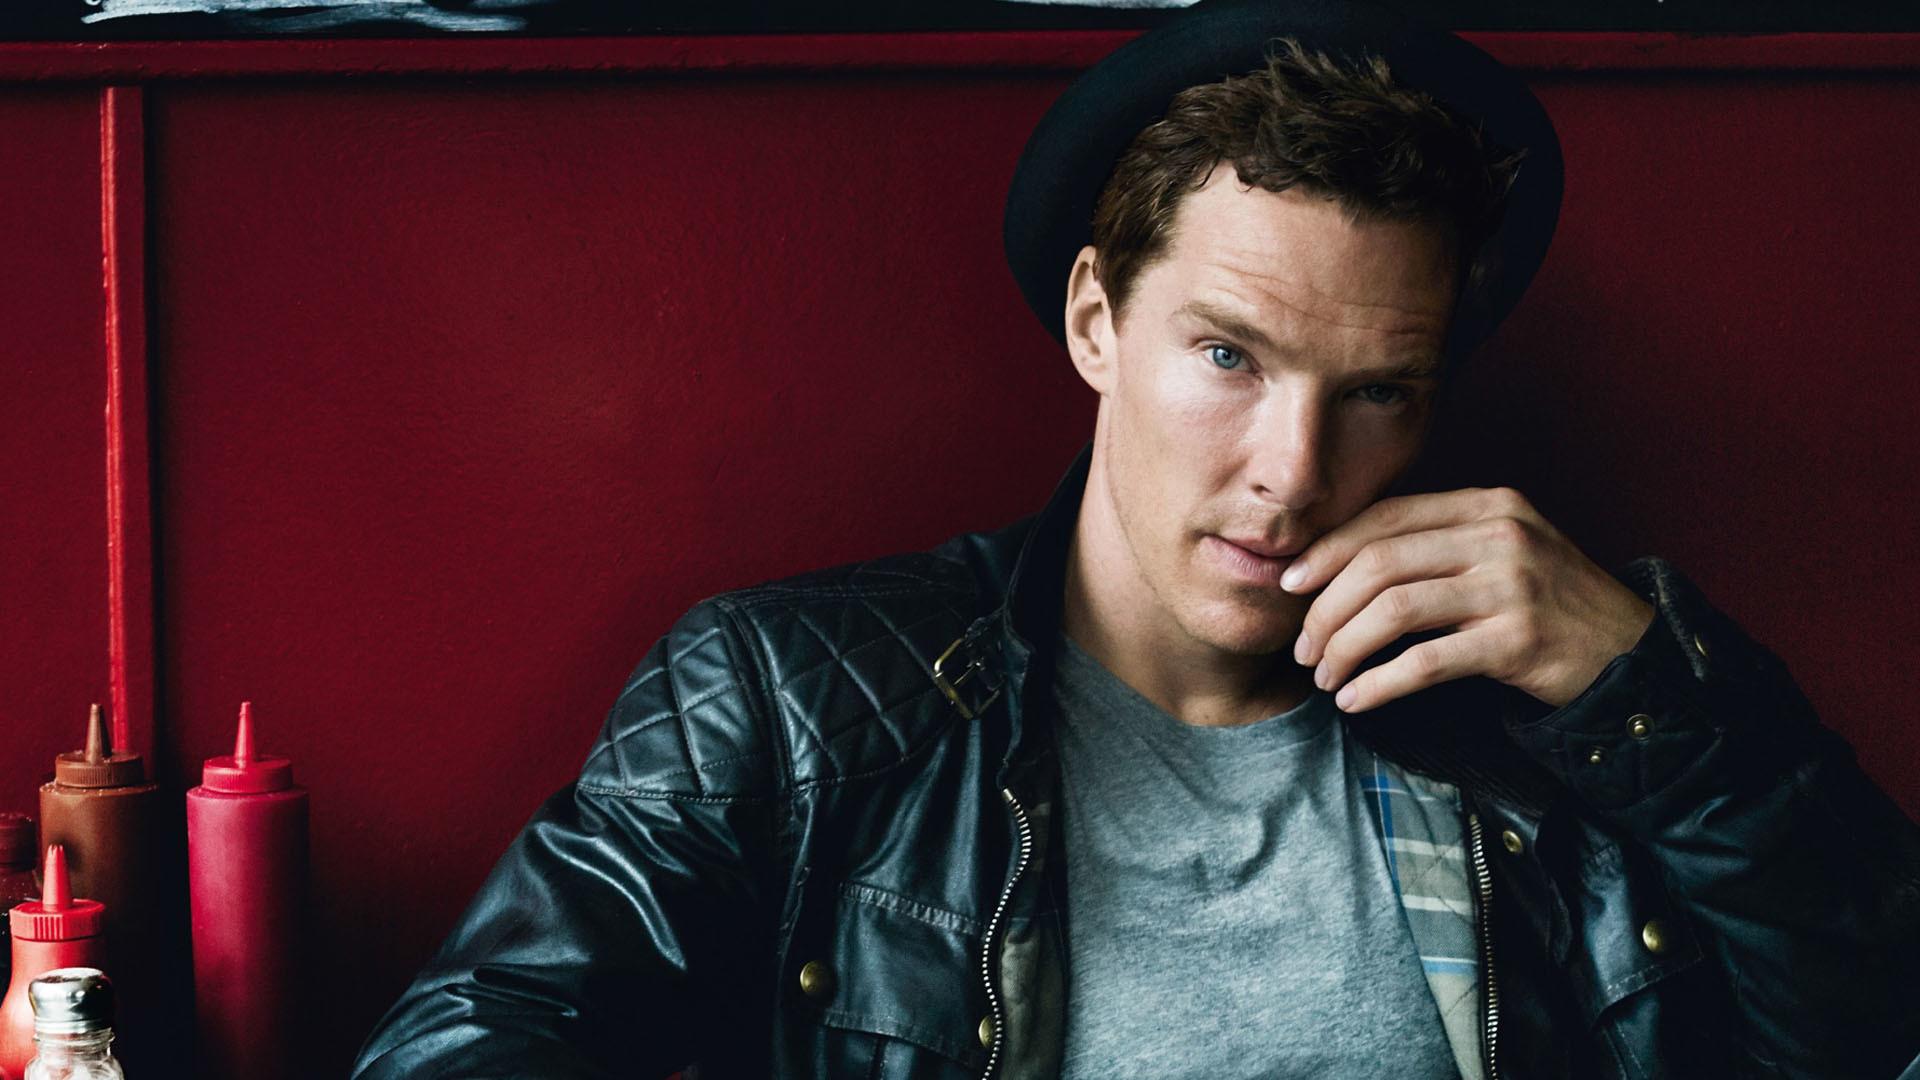 Benedict Cumberbatch Wallpaper Hd: Benedict Cumberbatch Wallpaper (80+ Images